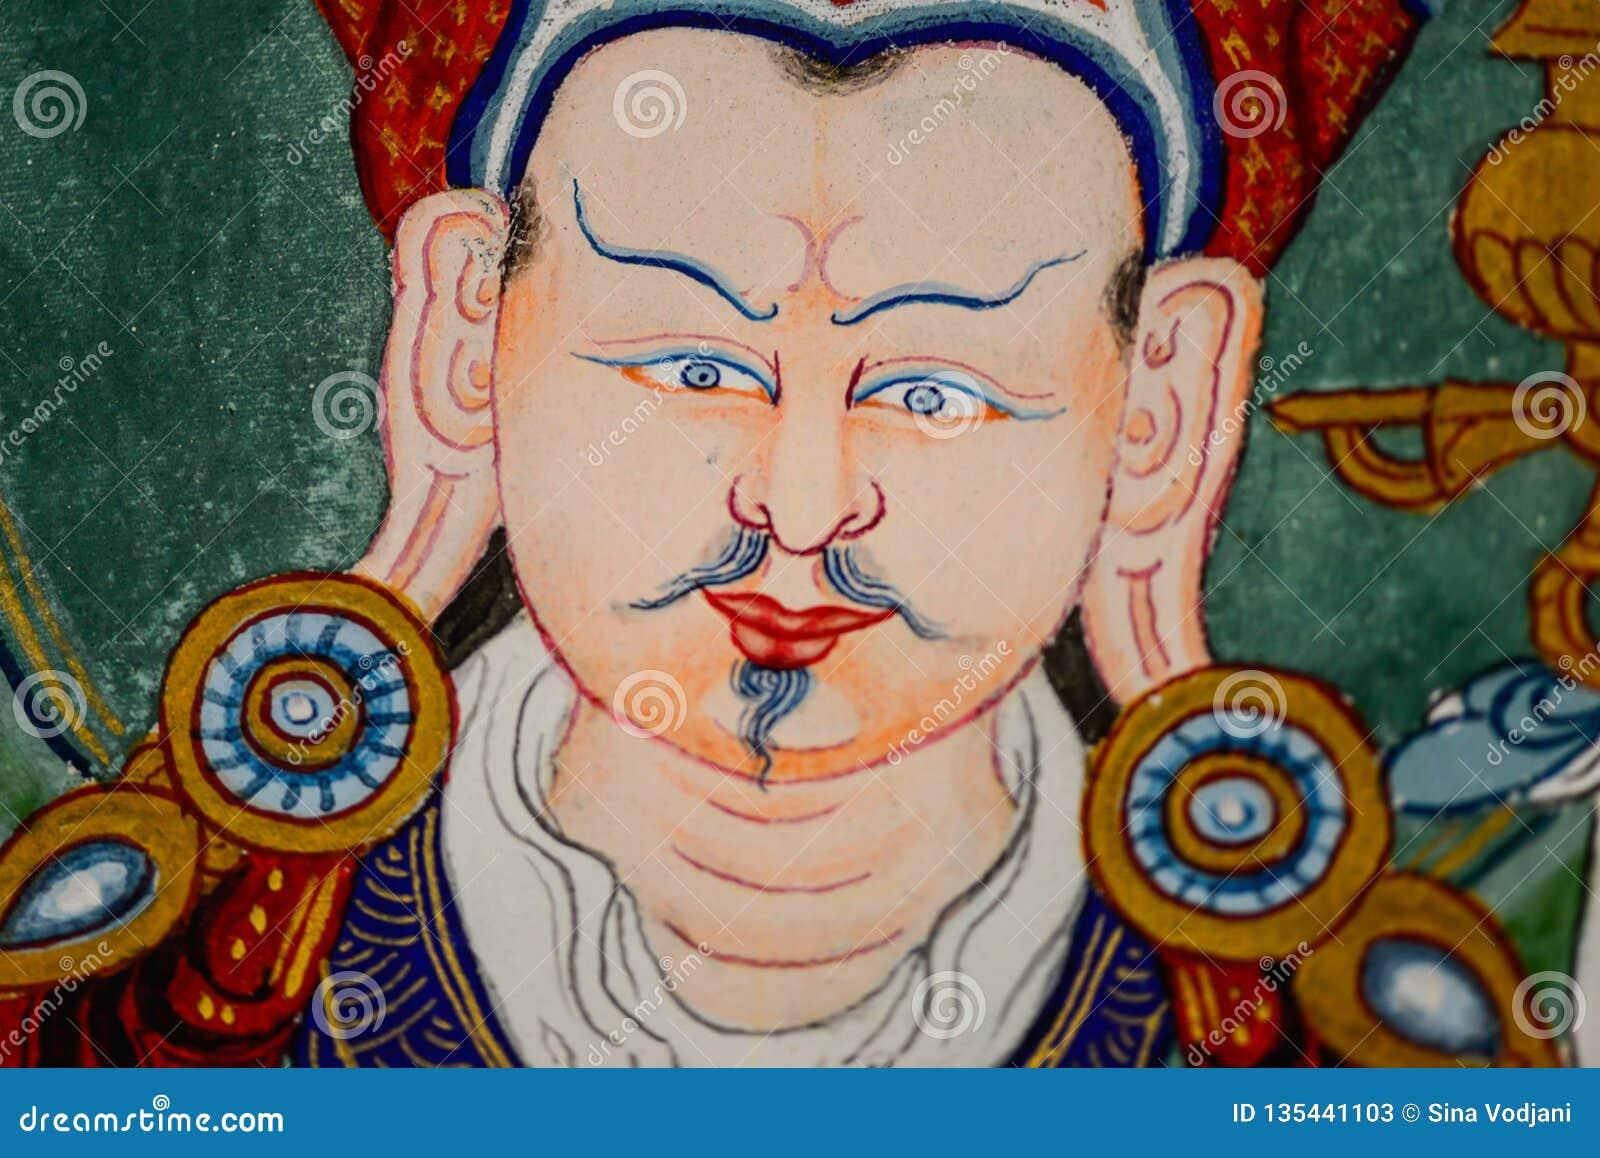 Pintura tibetana del thangka del retrato de Buda Padmasambhava, medicina Buda